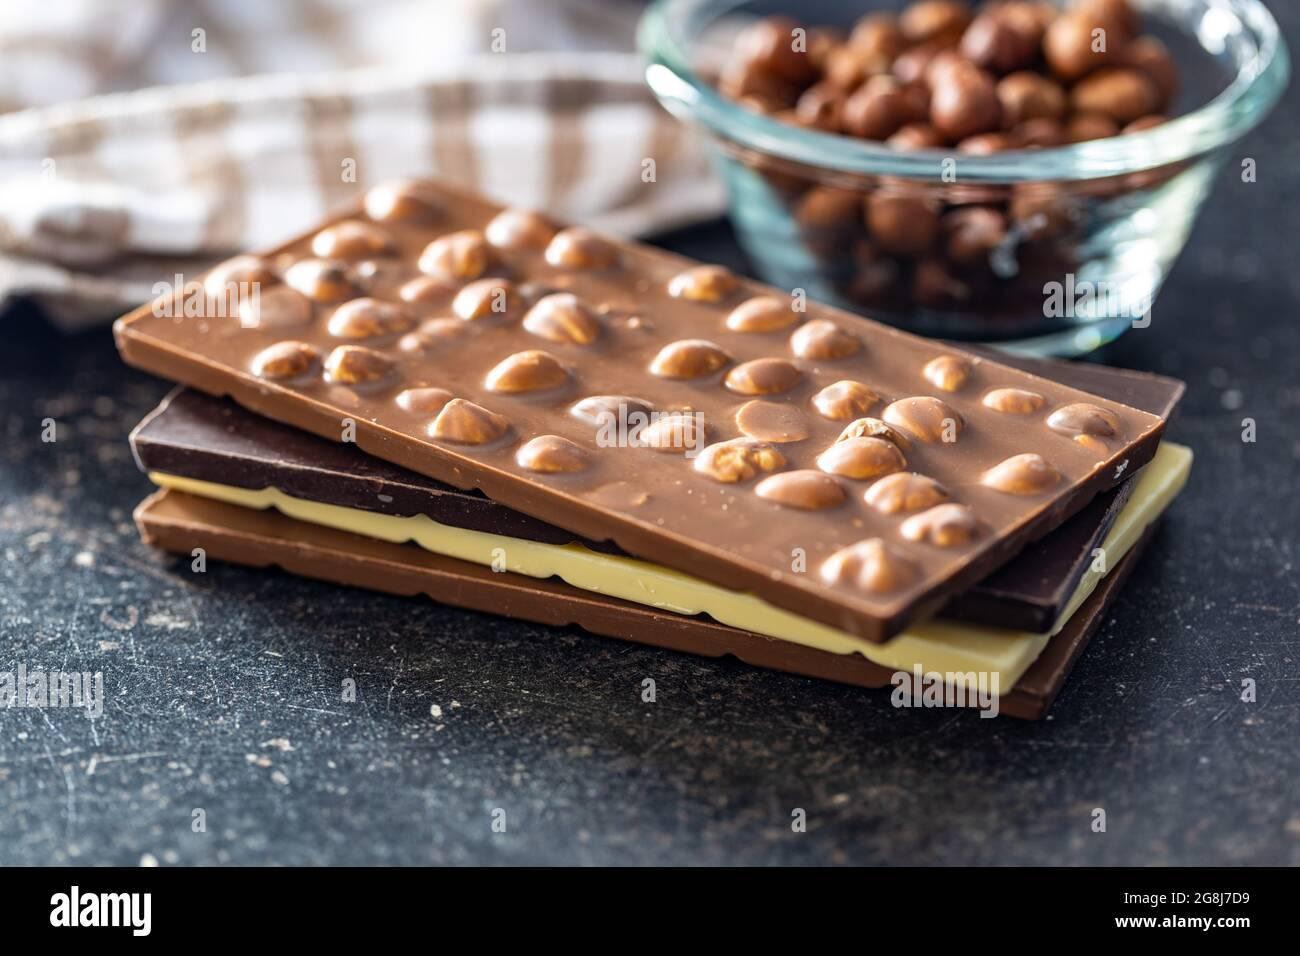 Varias barras de chocolate con avellanas sobre mesa negra. Foto de stock